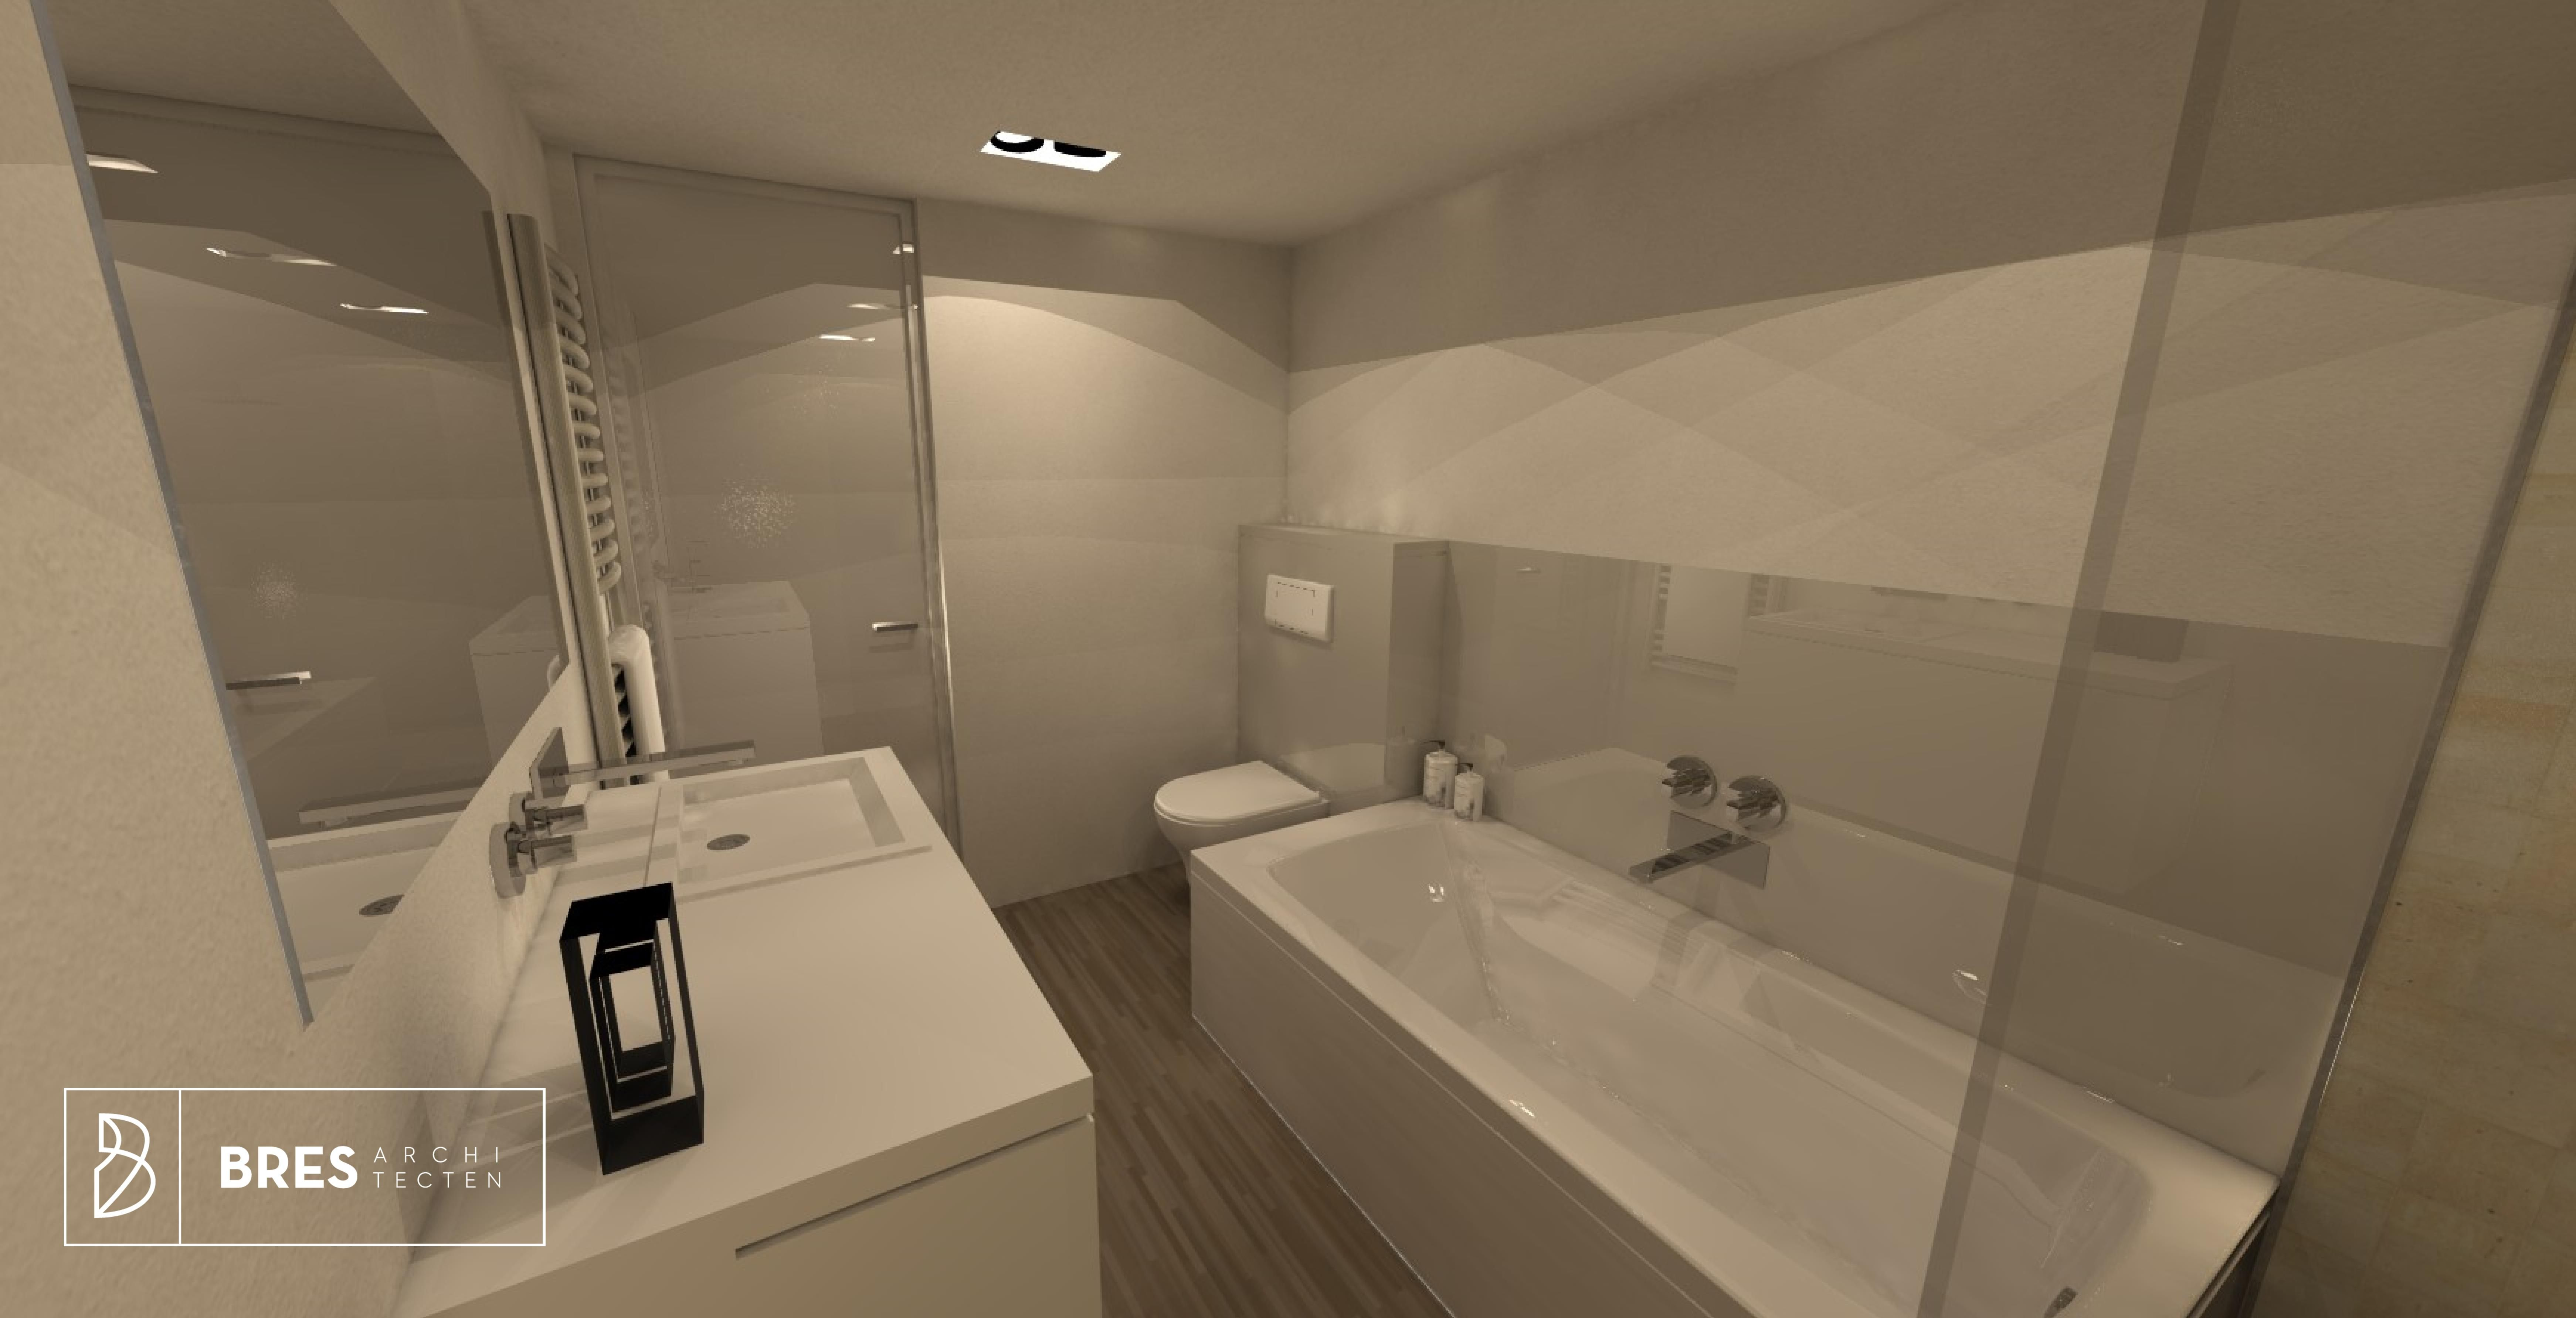 nieuwe badkamer   BRB LDS   Pinterest